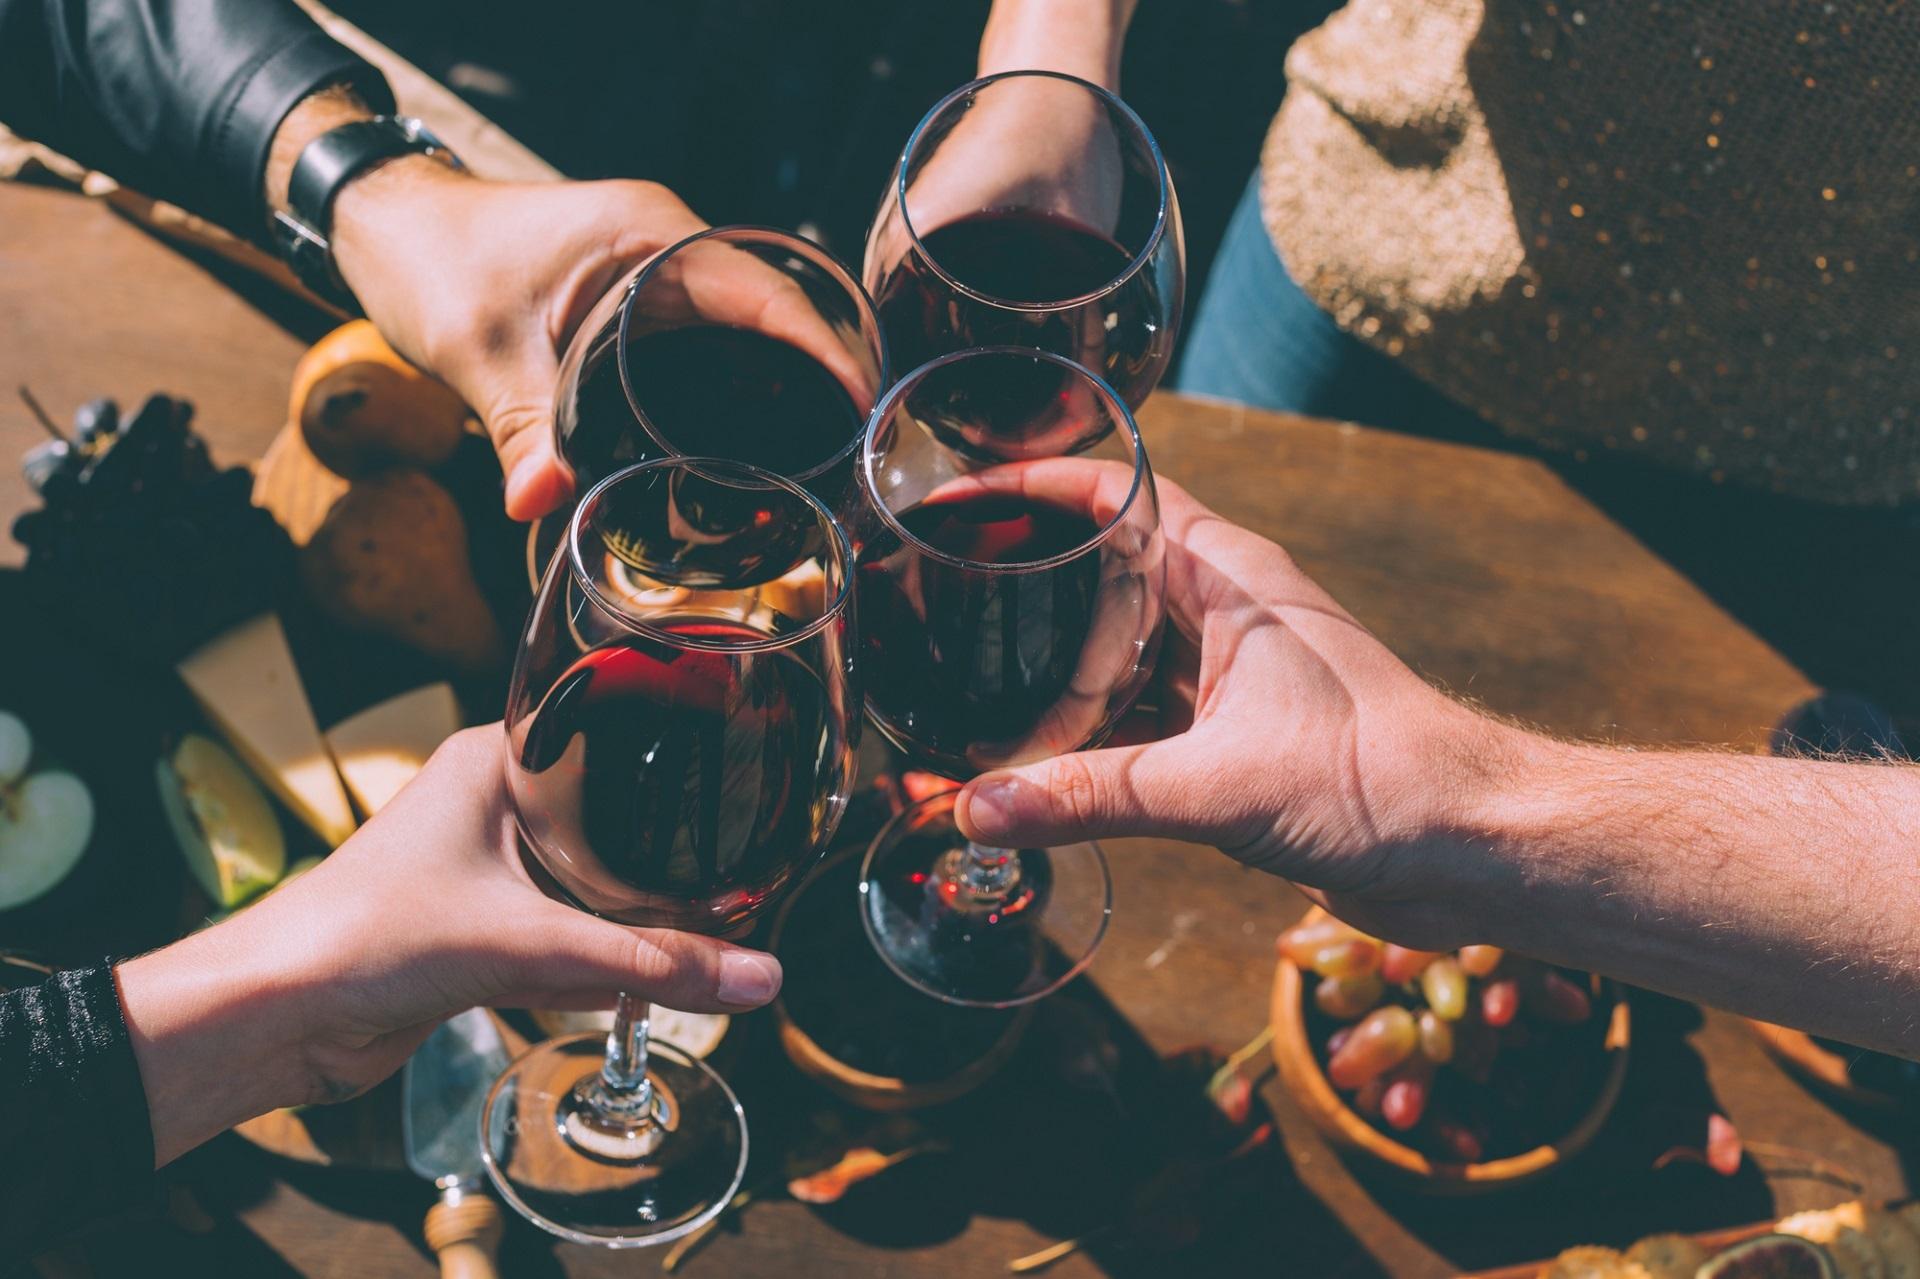 lampka wina, wino, alkohol